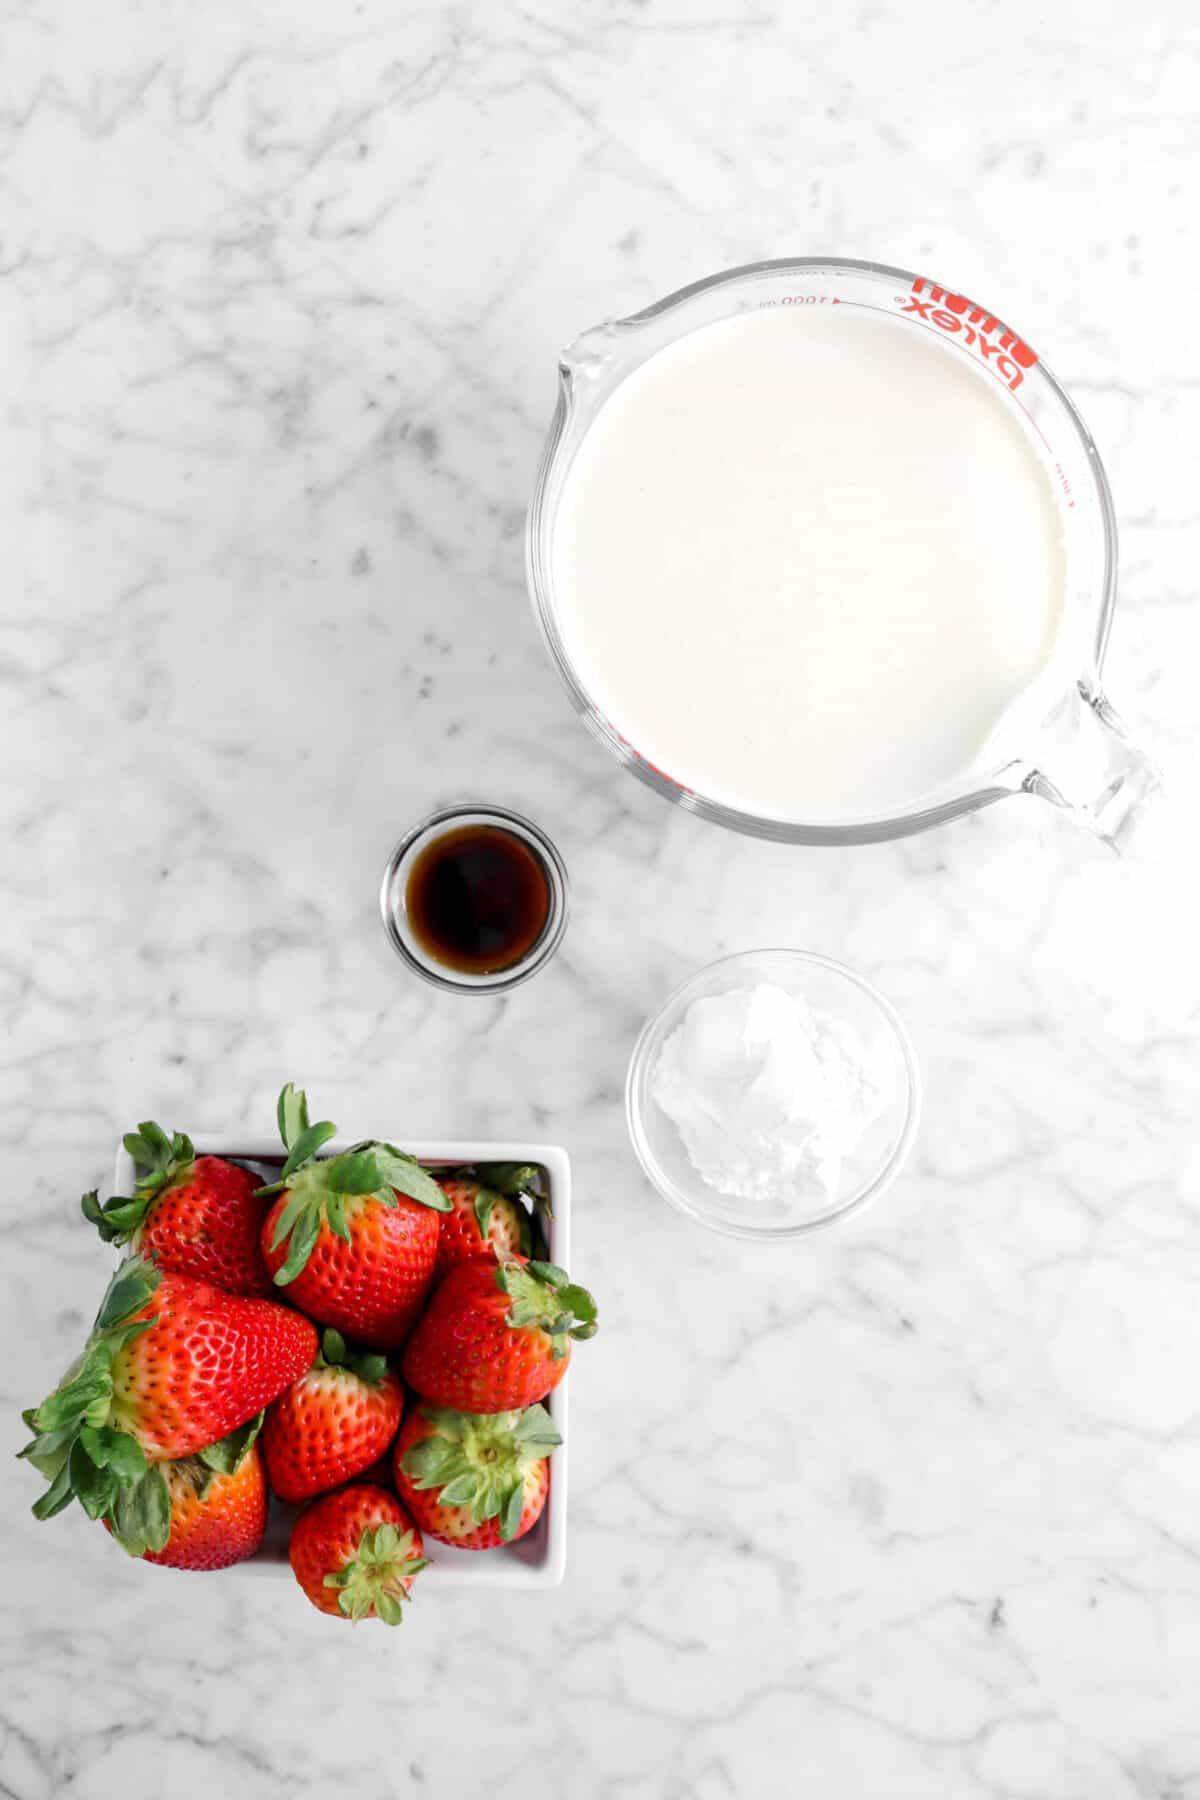 cream, vanilla, powdered sugar, and strawberries on marble counter